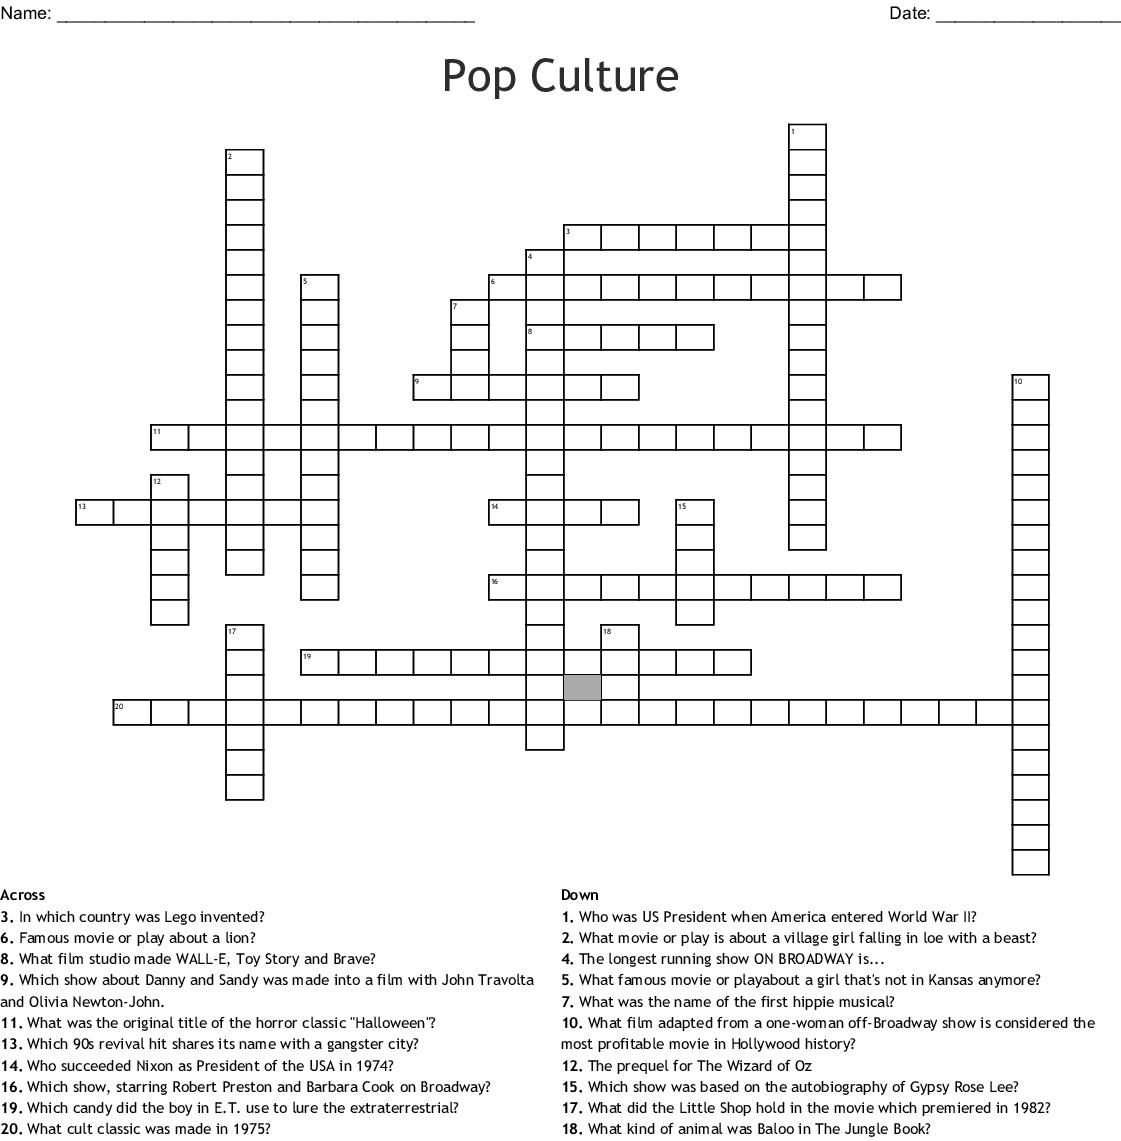 Pop Culture Crossword - Wordmint - Pop Culture Crossword Puzzles Printable